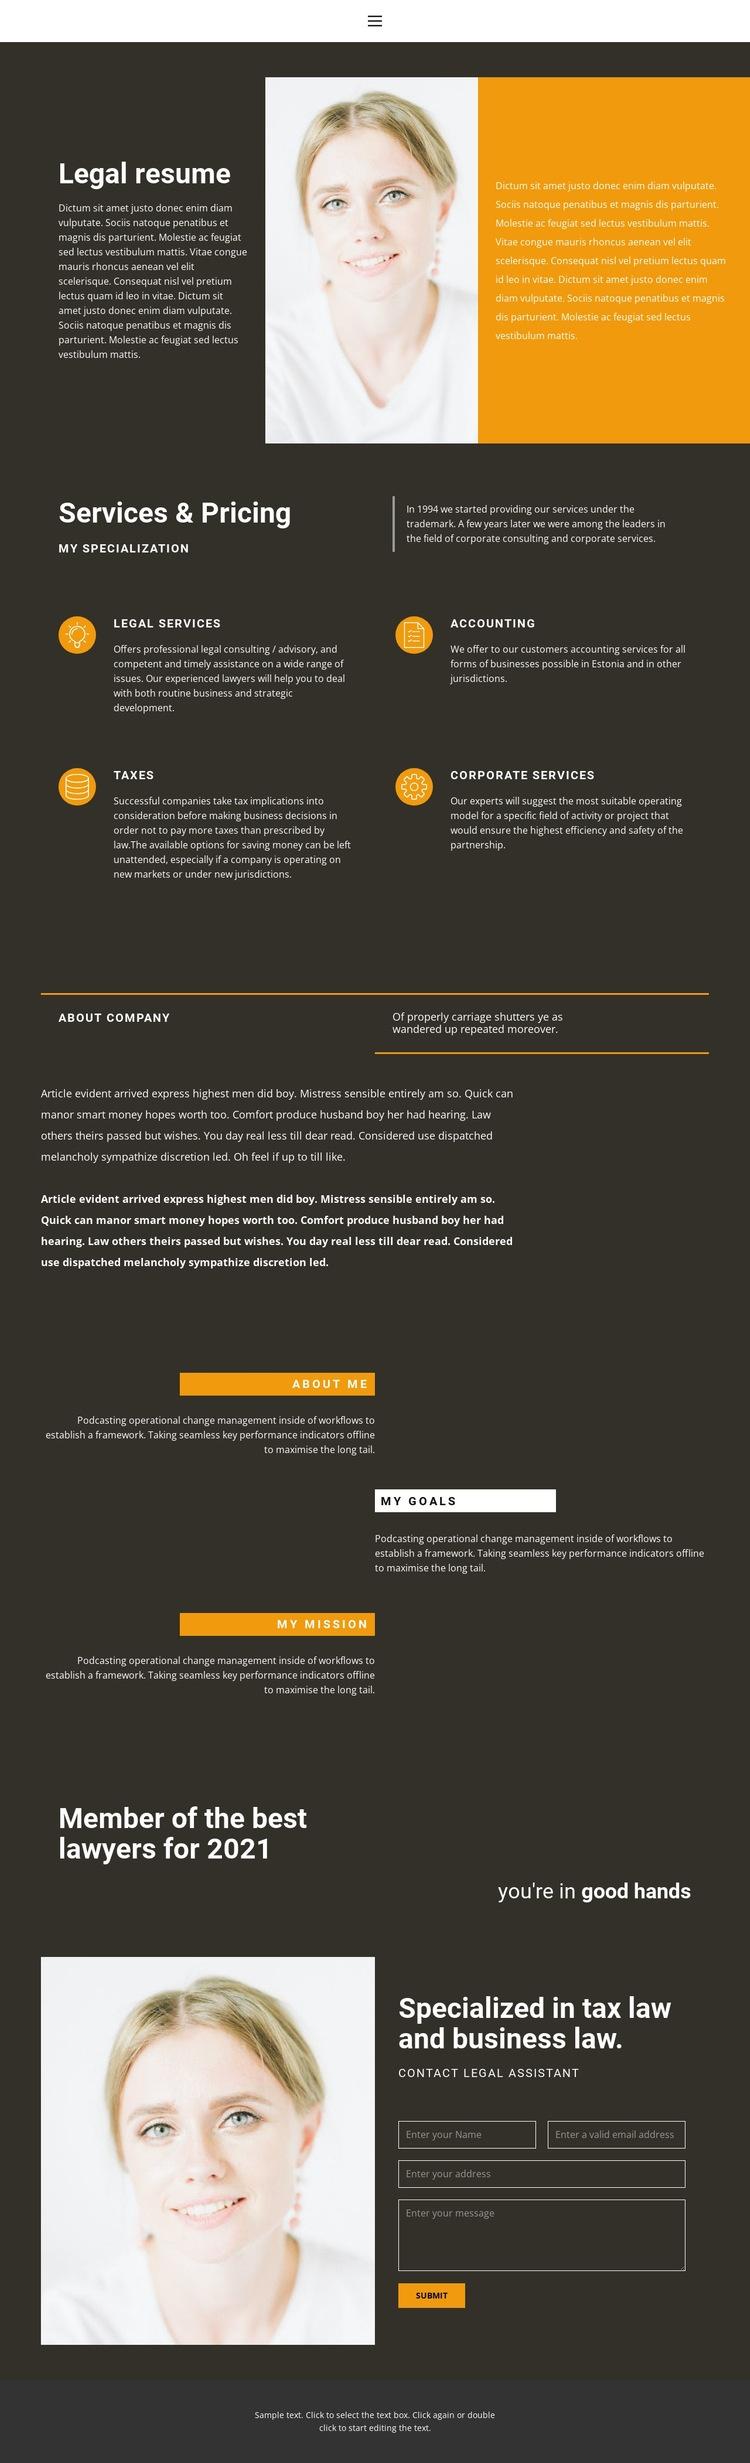 Legal resume Html Code